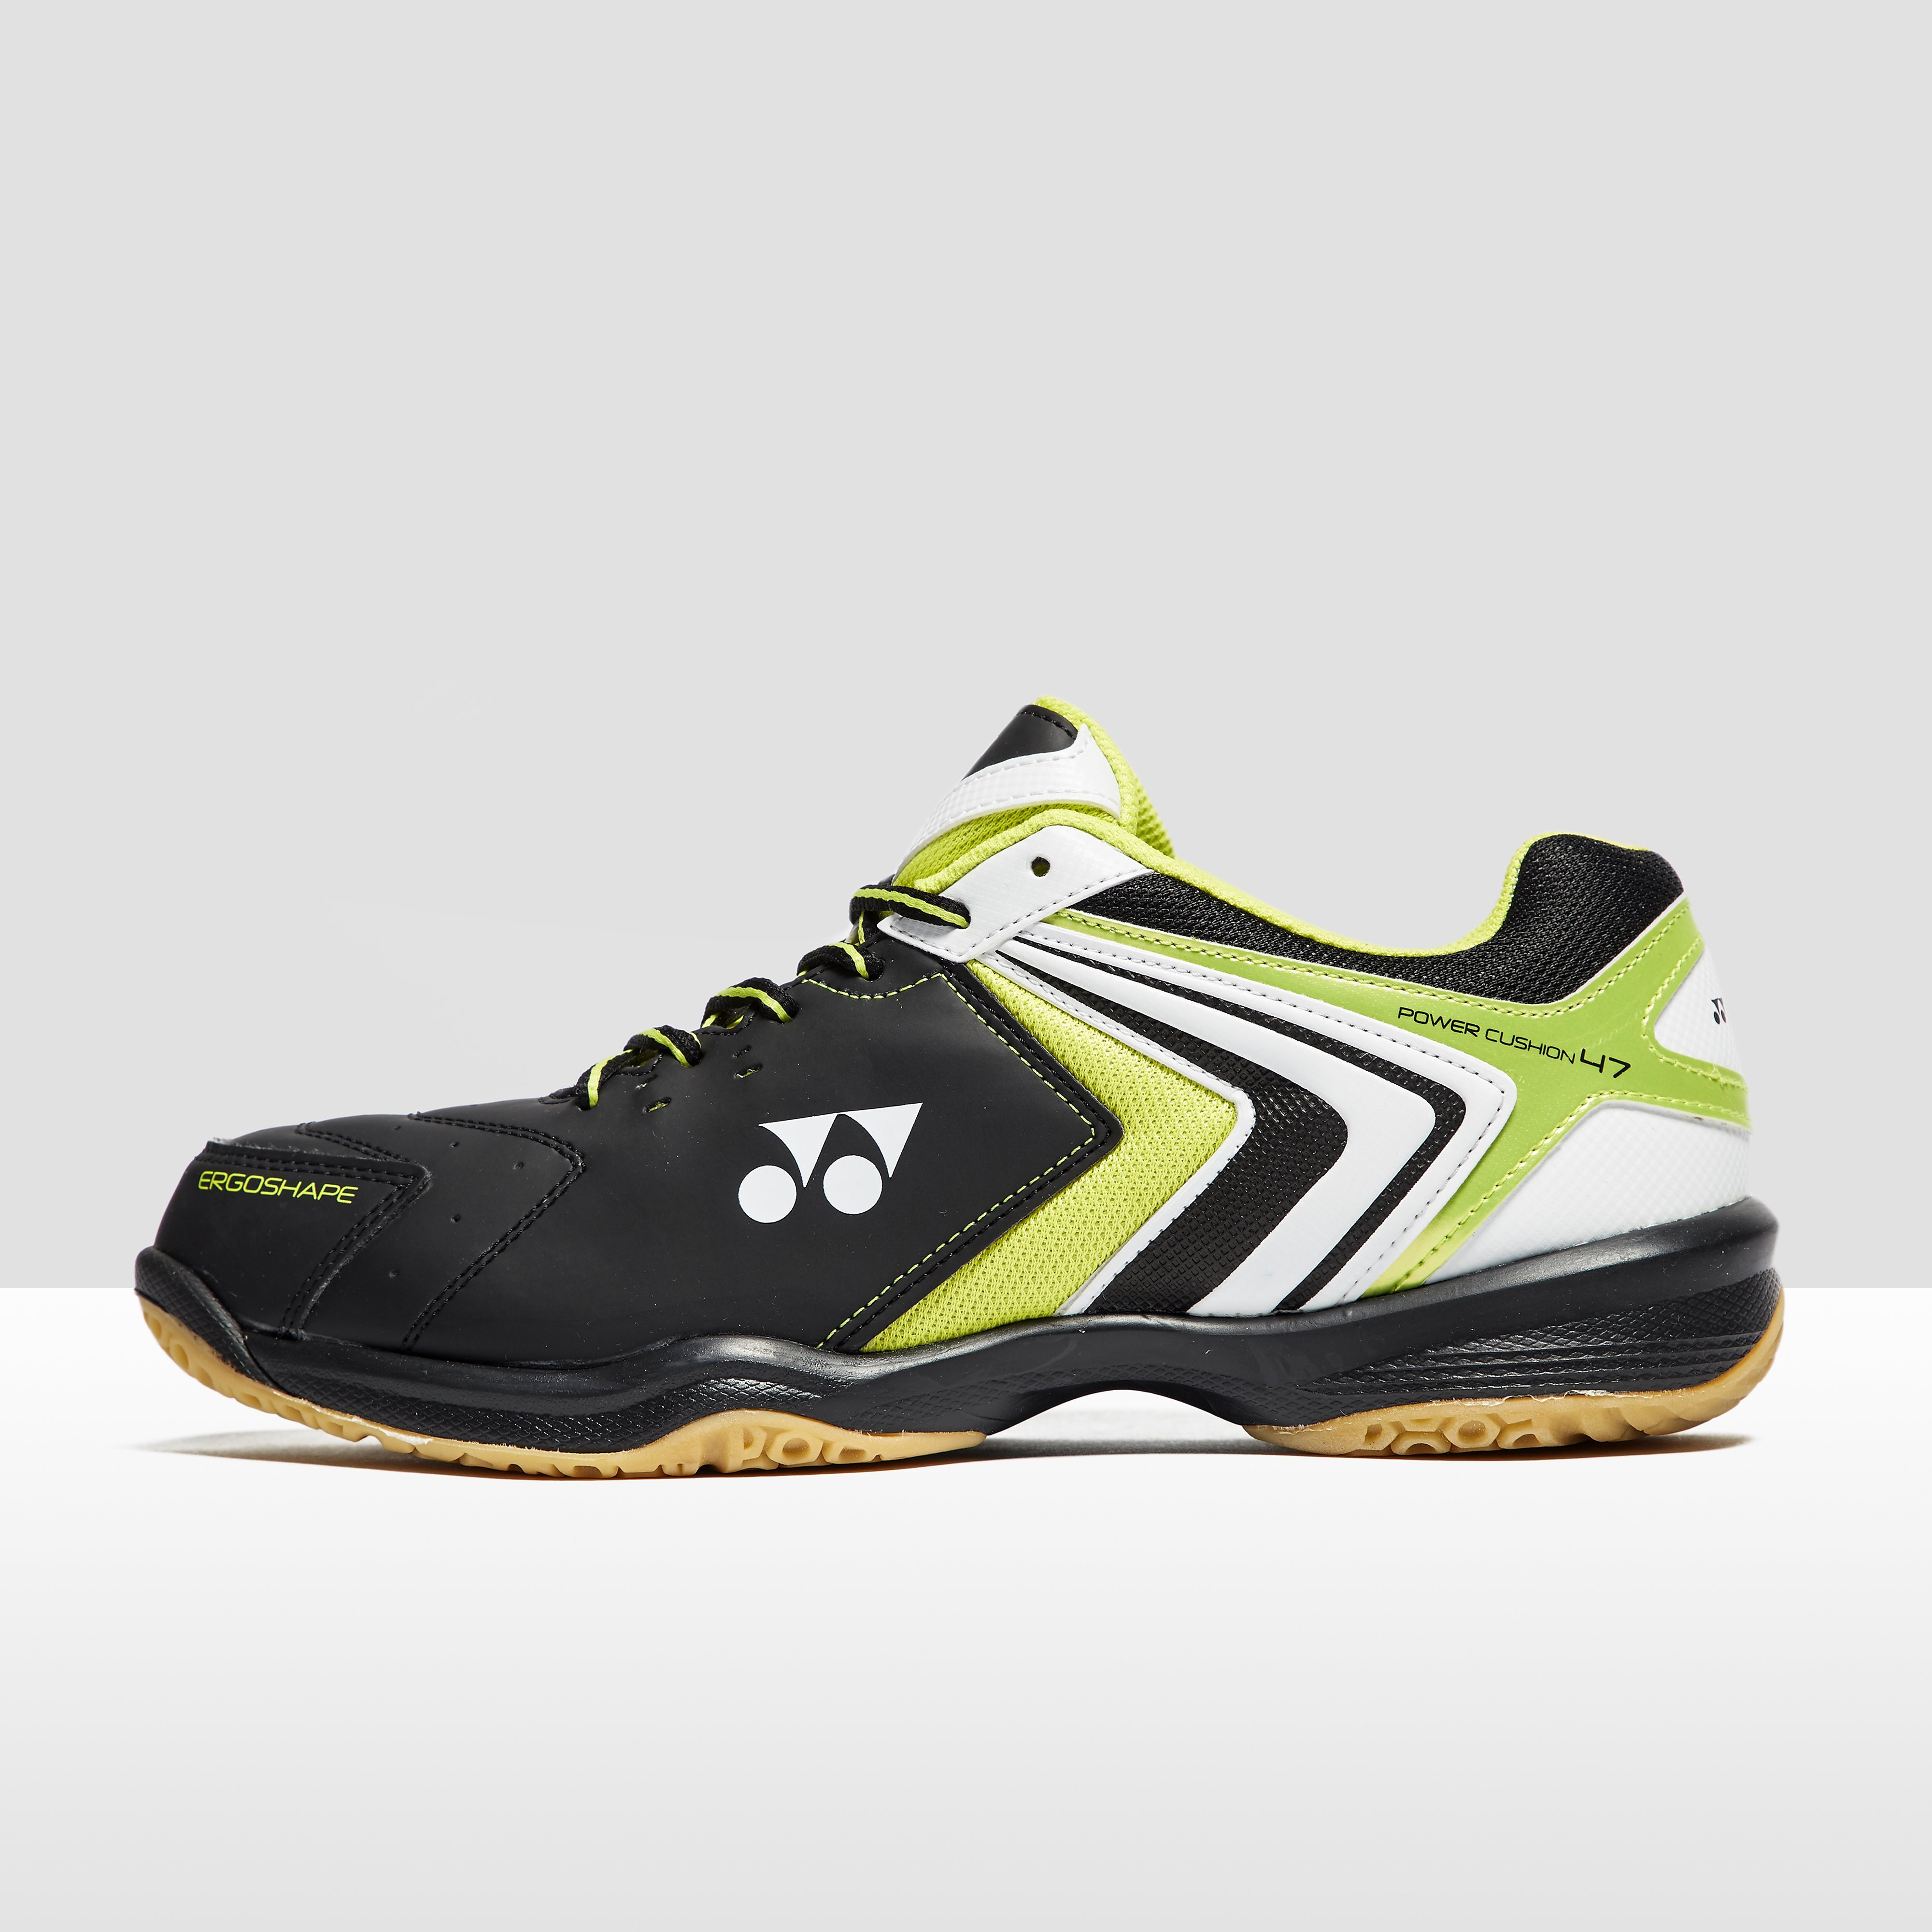 Yonex Power Cushion 47 Men's Badminton Shoes